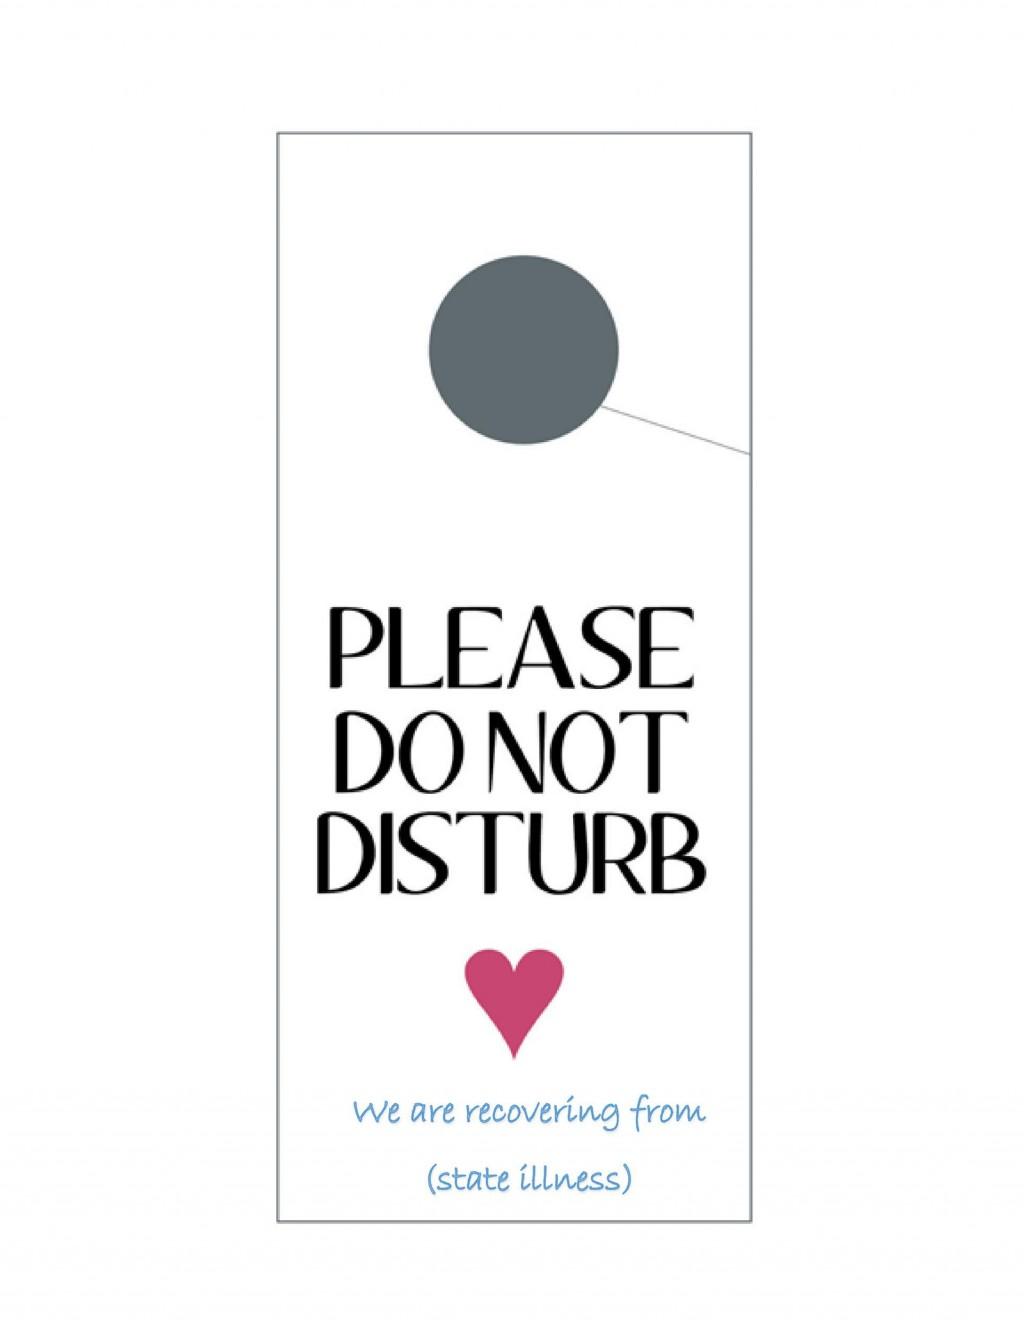 006 Rare Free Template For Door Hanger Word Highest Quality  WeddingLarge